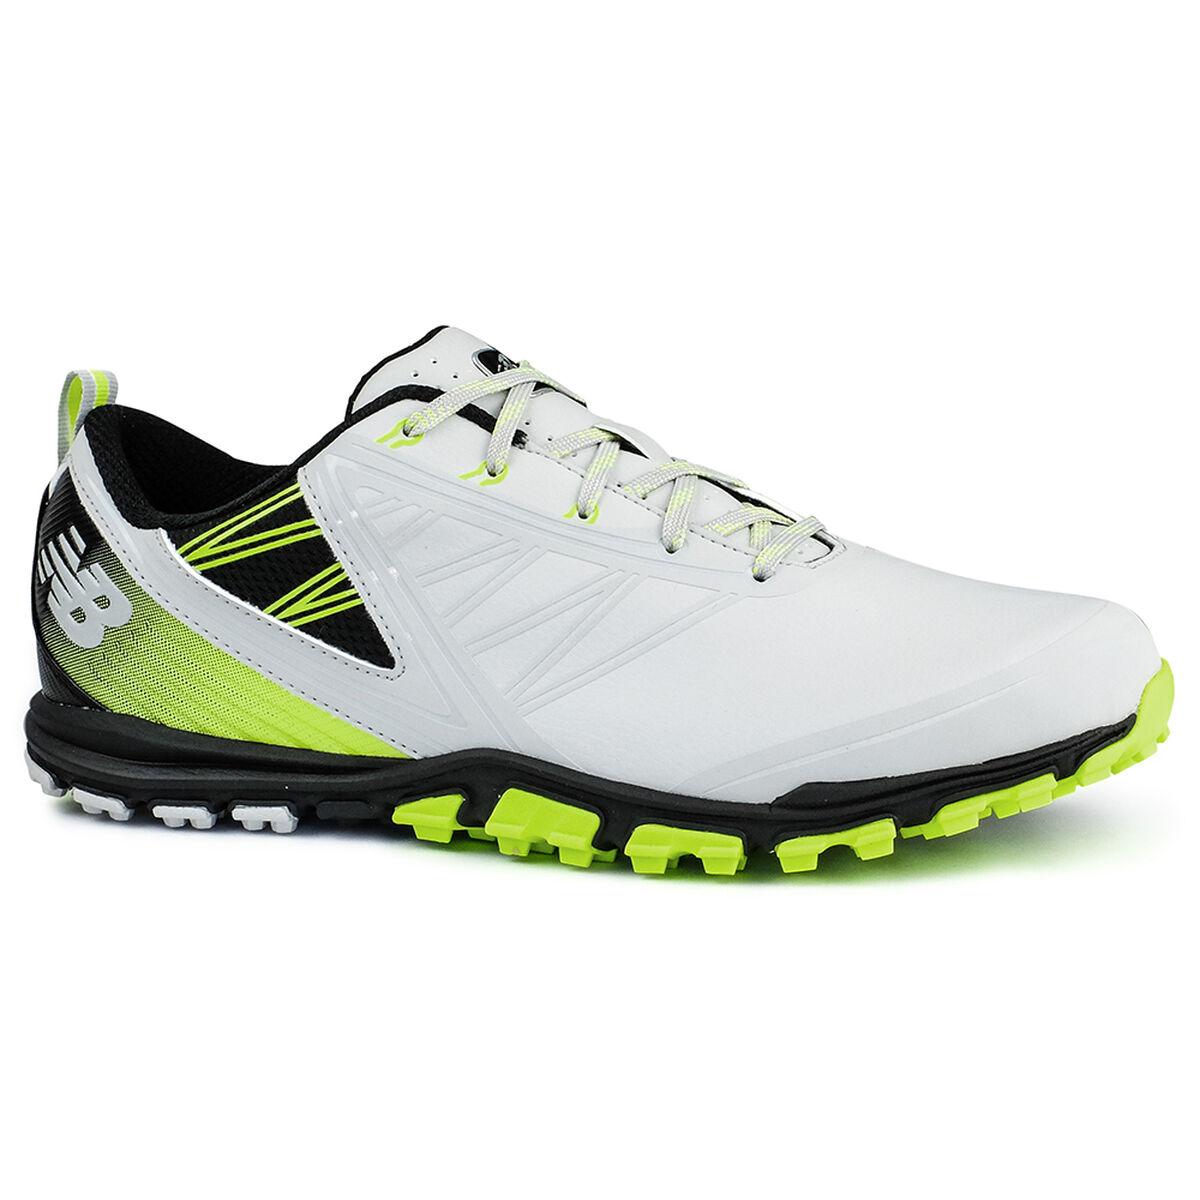 5df15214b8d05 New Balance Minimus SL Men's Golf Shoe - Grey | PGA TOUR Superstore